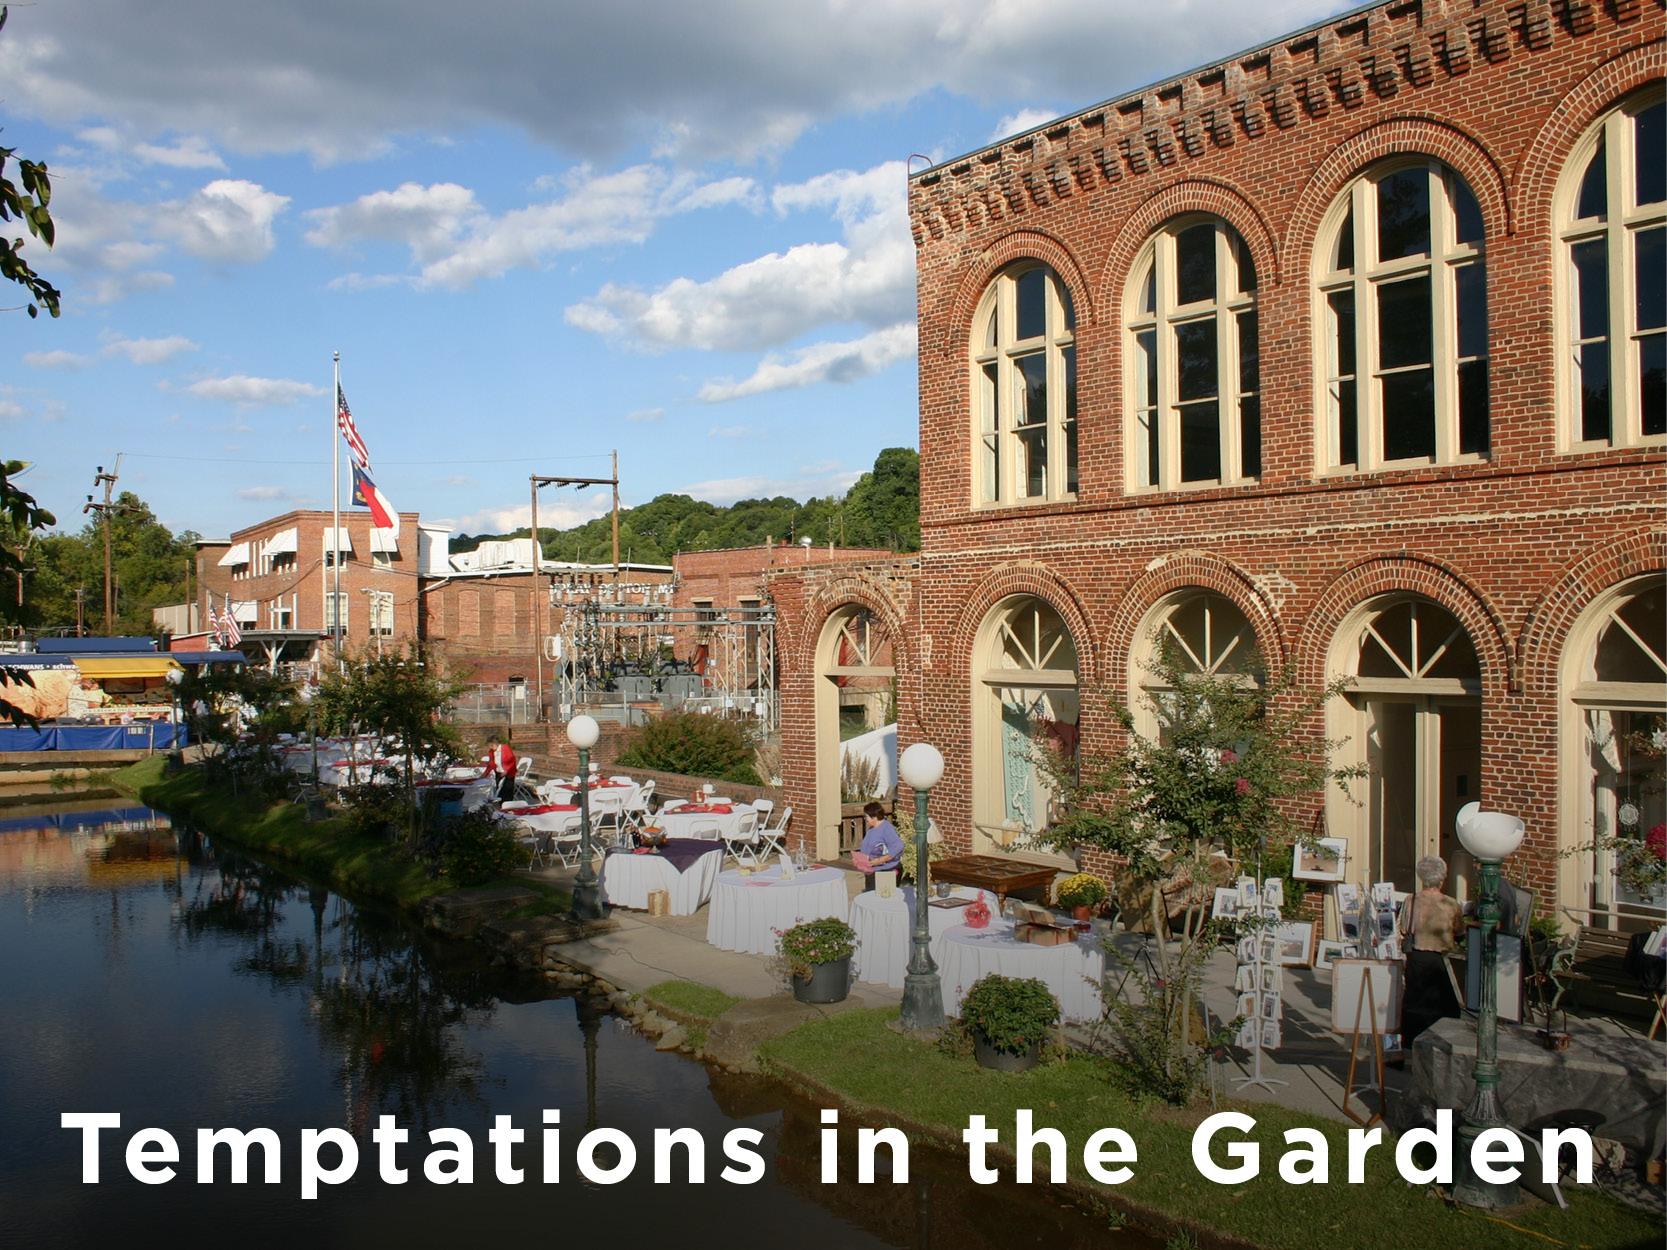 Temptations in the Garden